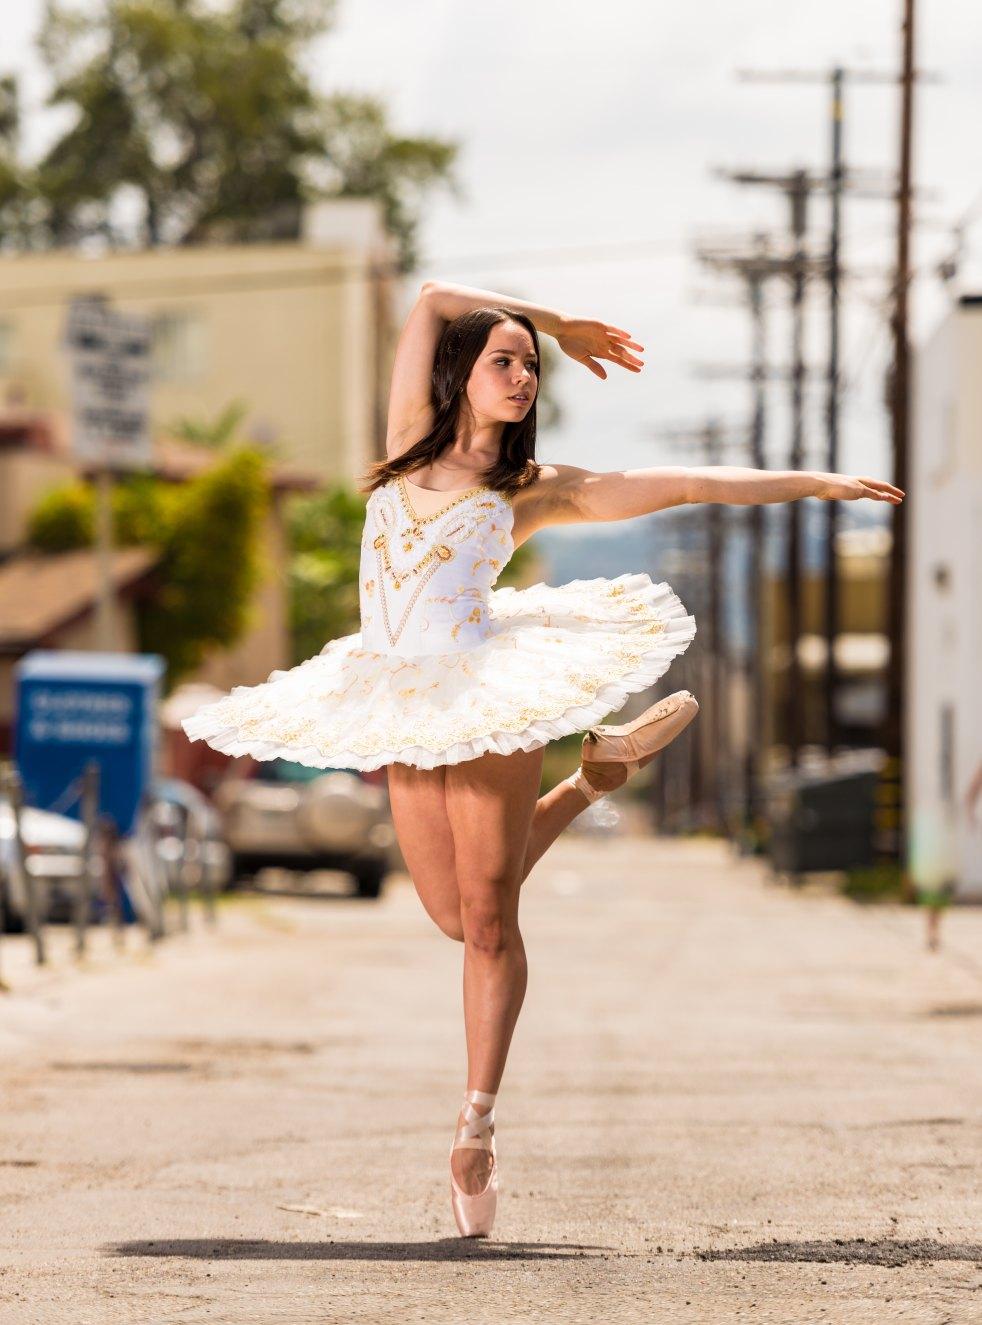 Femme qui danse